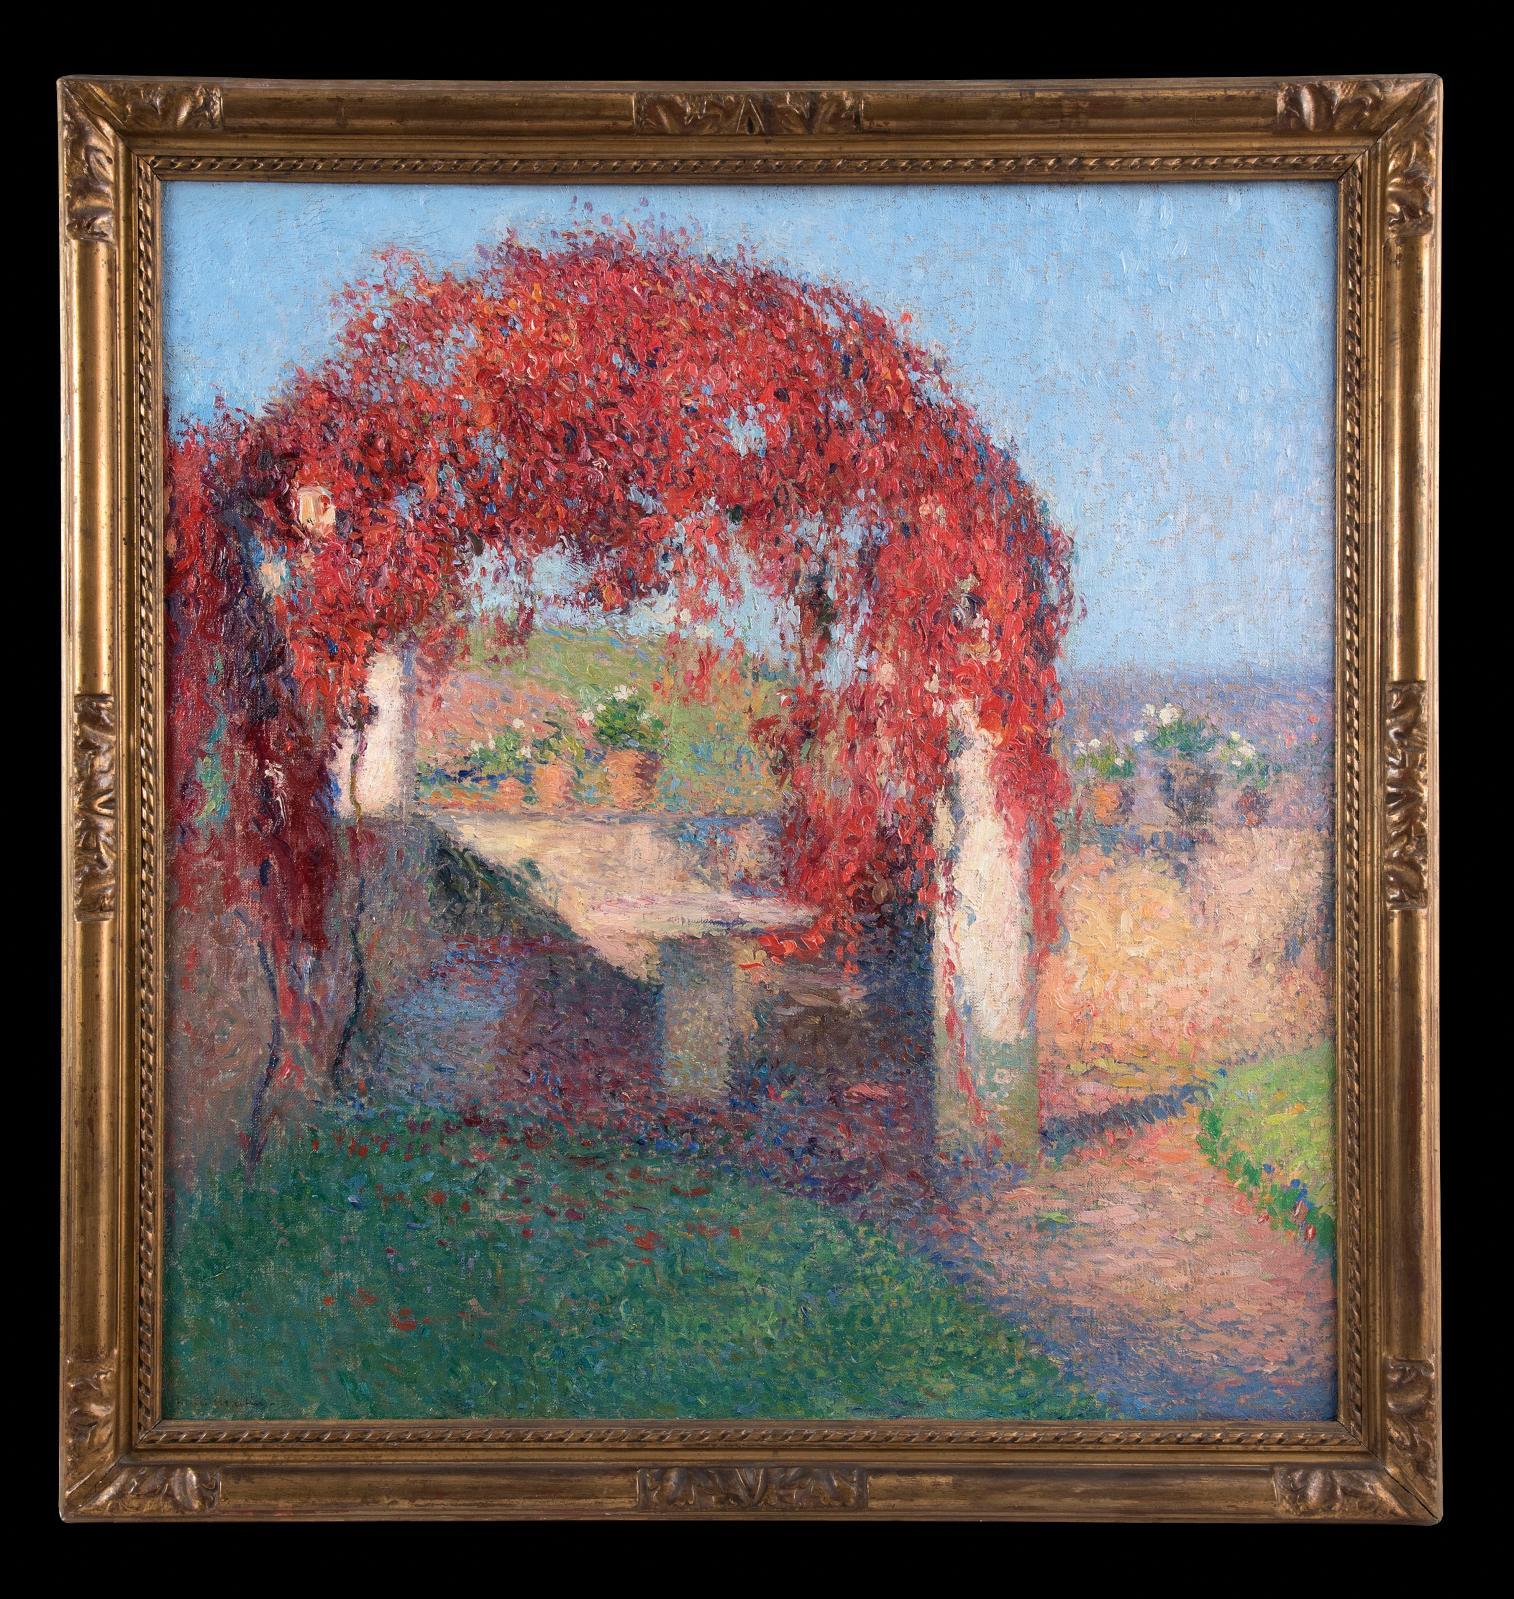 Henri Martin (1860-1943), La Pergola à l'automne, Marquayrol, vers 1910-1920, huile sur toile, 84x80,5cm. Adjugé: 170016€